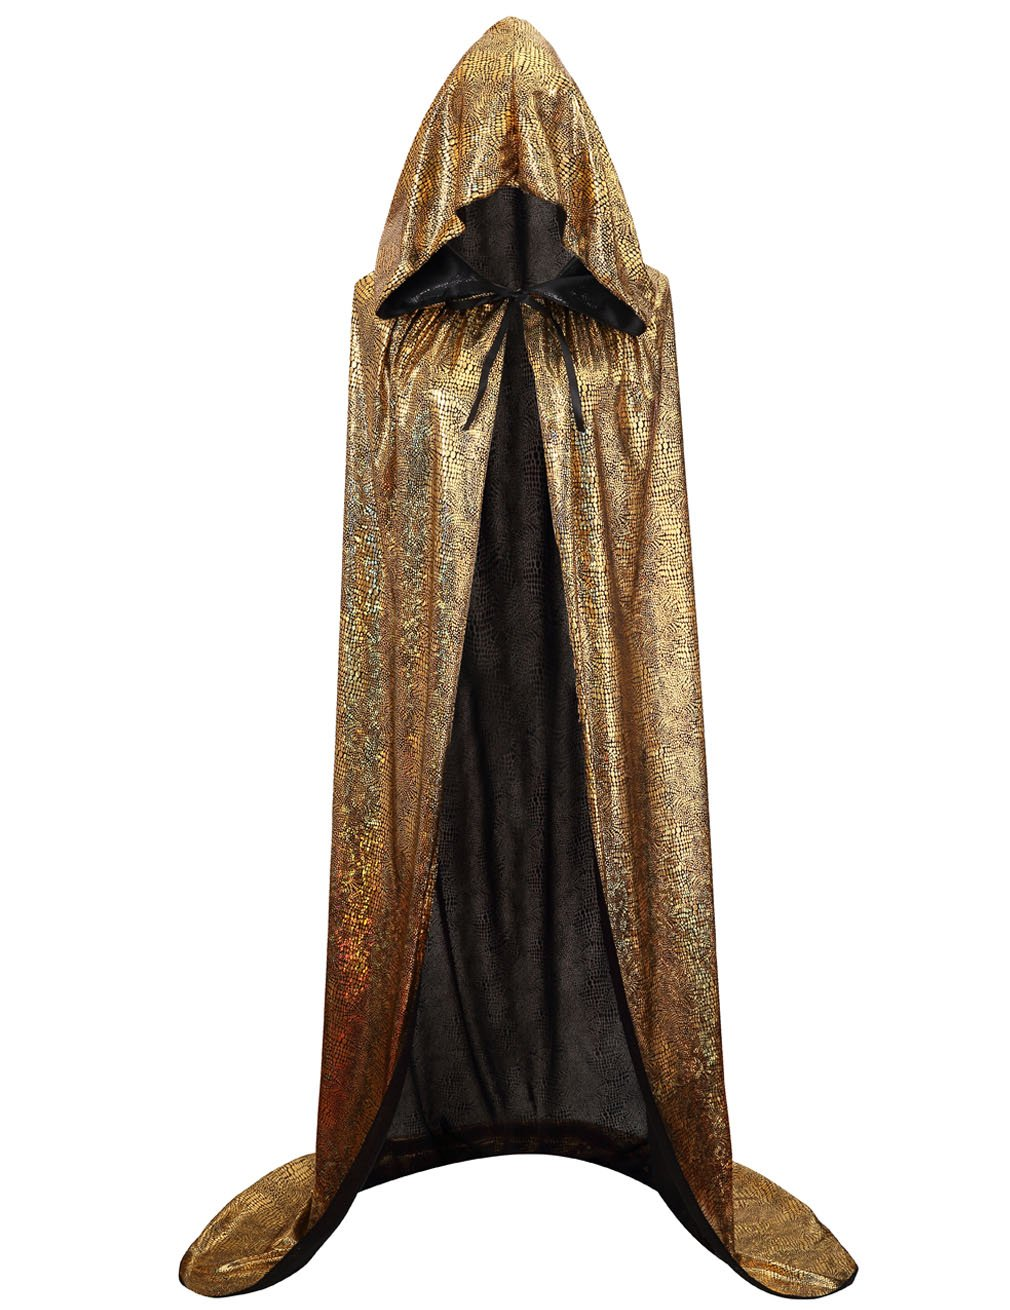 Hamour Unisex Halloween Cape Full Length Hooded Cloak Adult Costume Laser Blue)